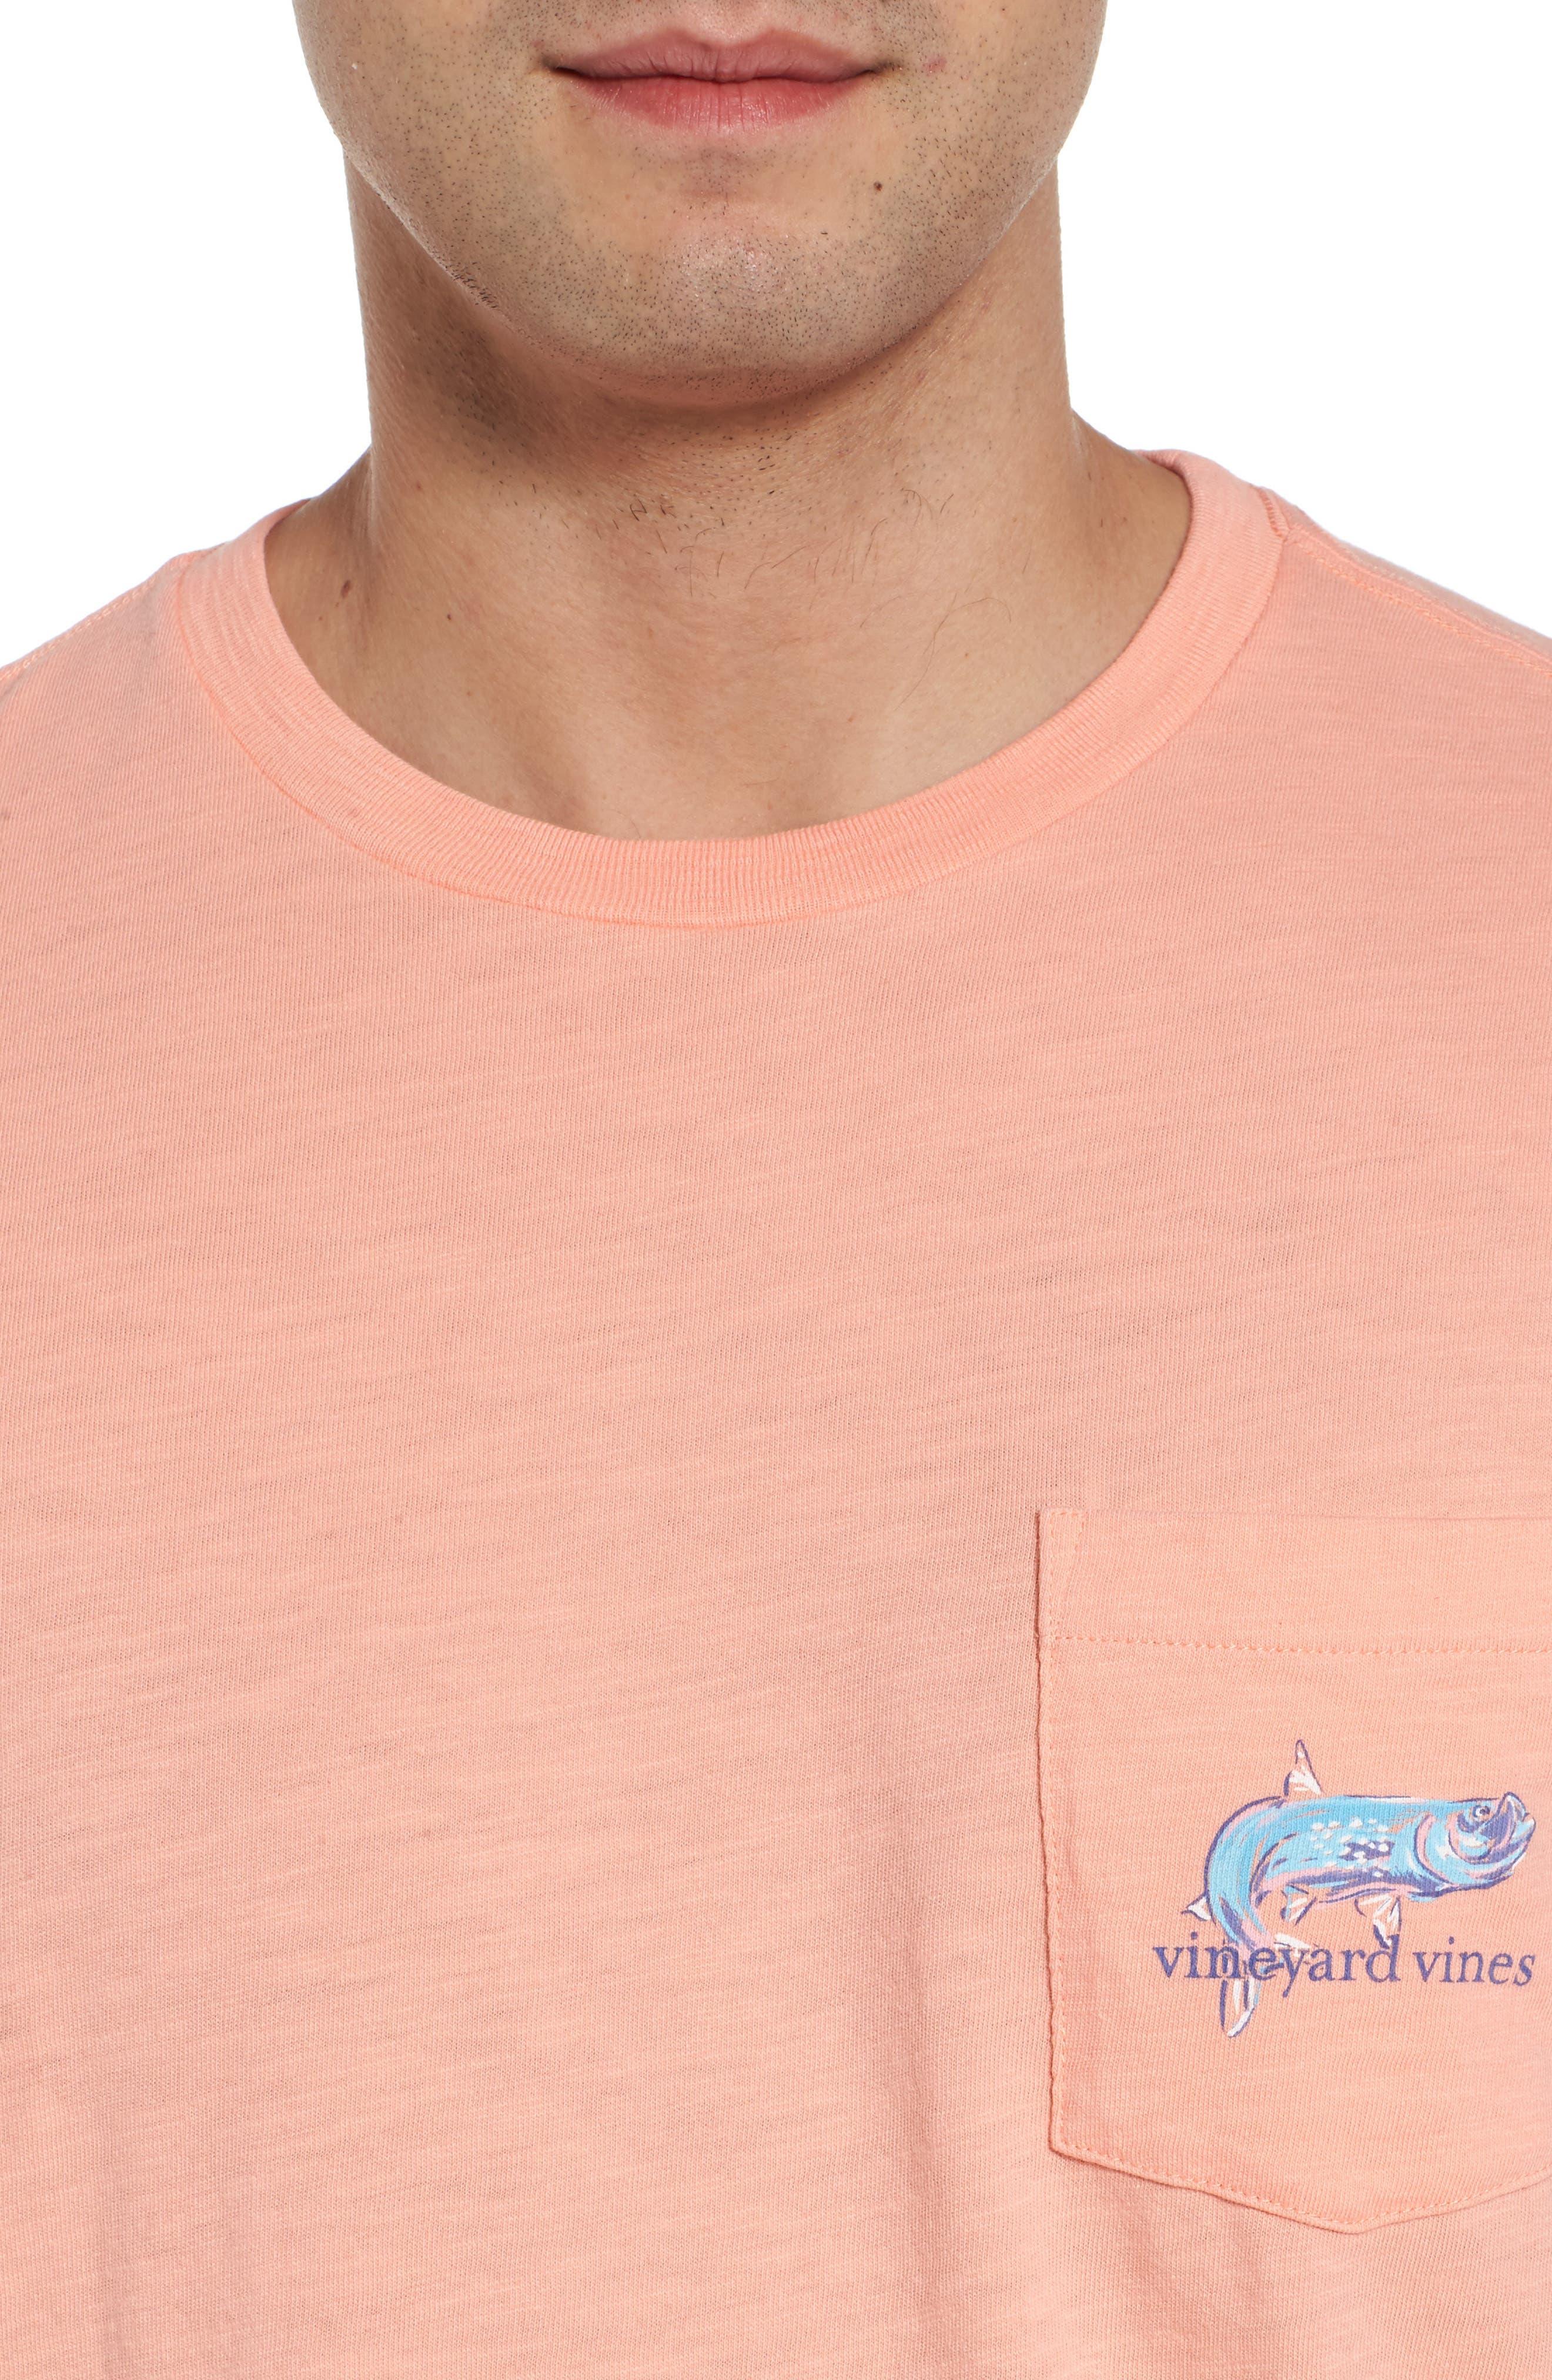 Alternate Image 4  - vineyard vines Painted Tarpon Graphic Pocket T-Shirt